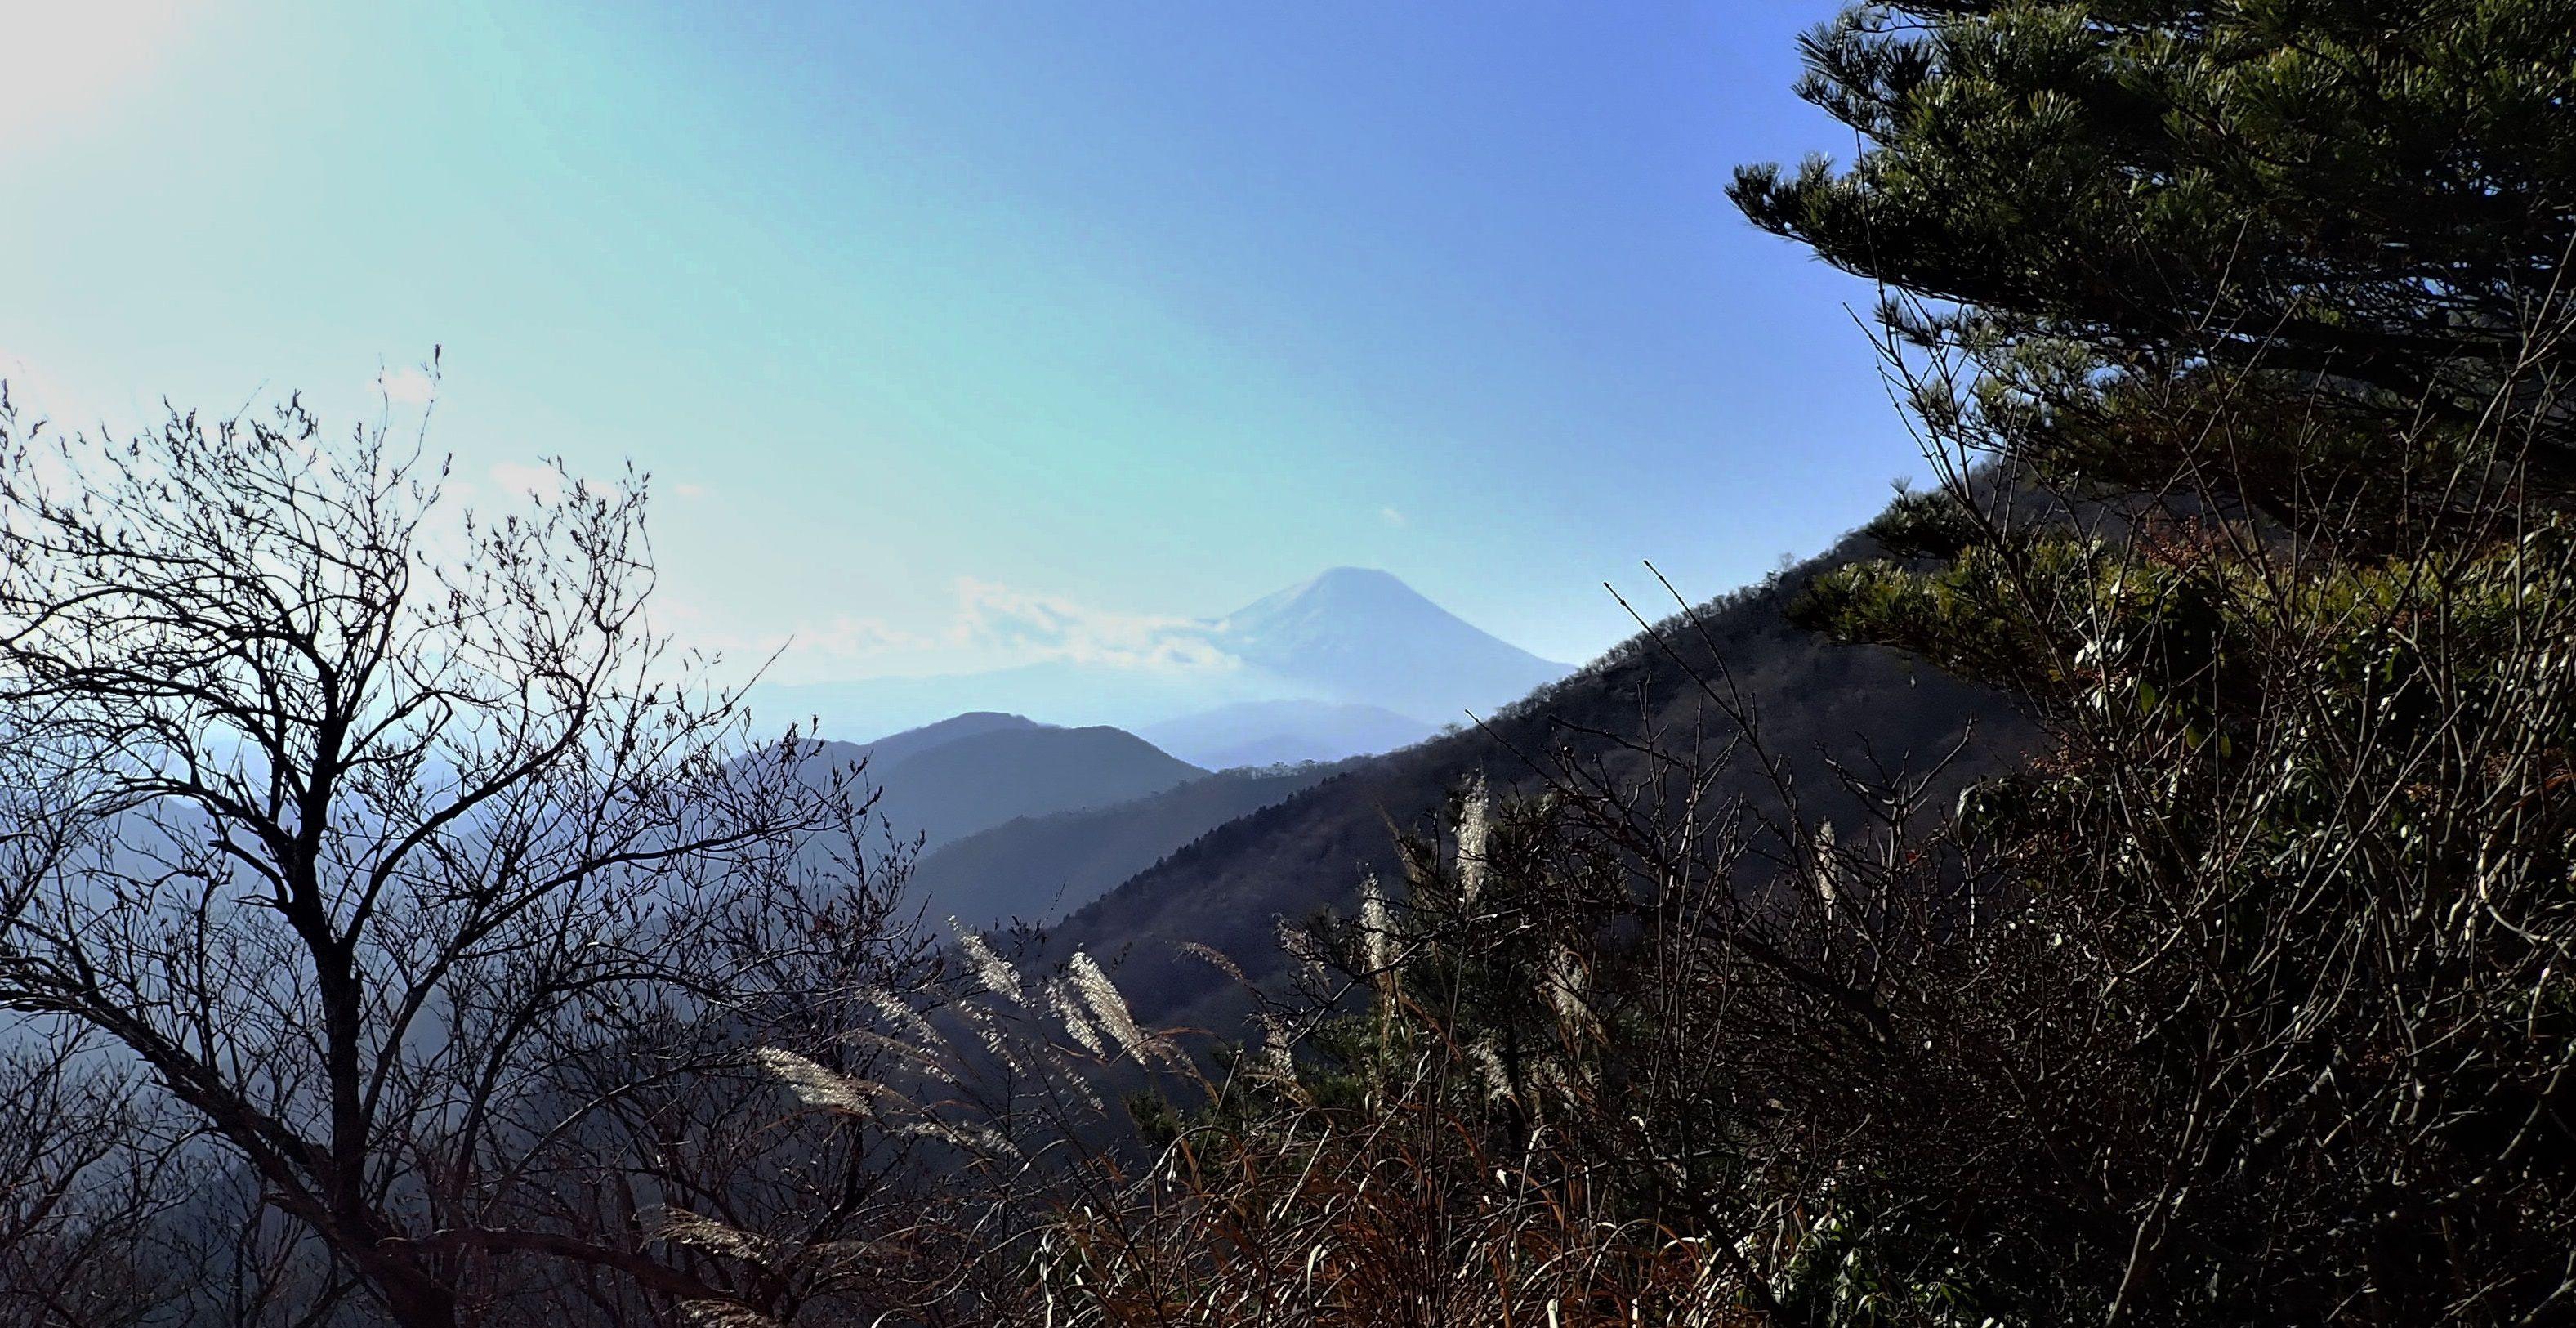 c2e4dc5cf0 塔ノ岳へ新年山行ー丹沢の表尾根から大倉尾根へー. 2019年1月5日( ...